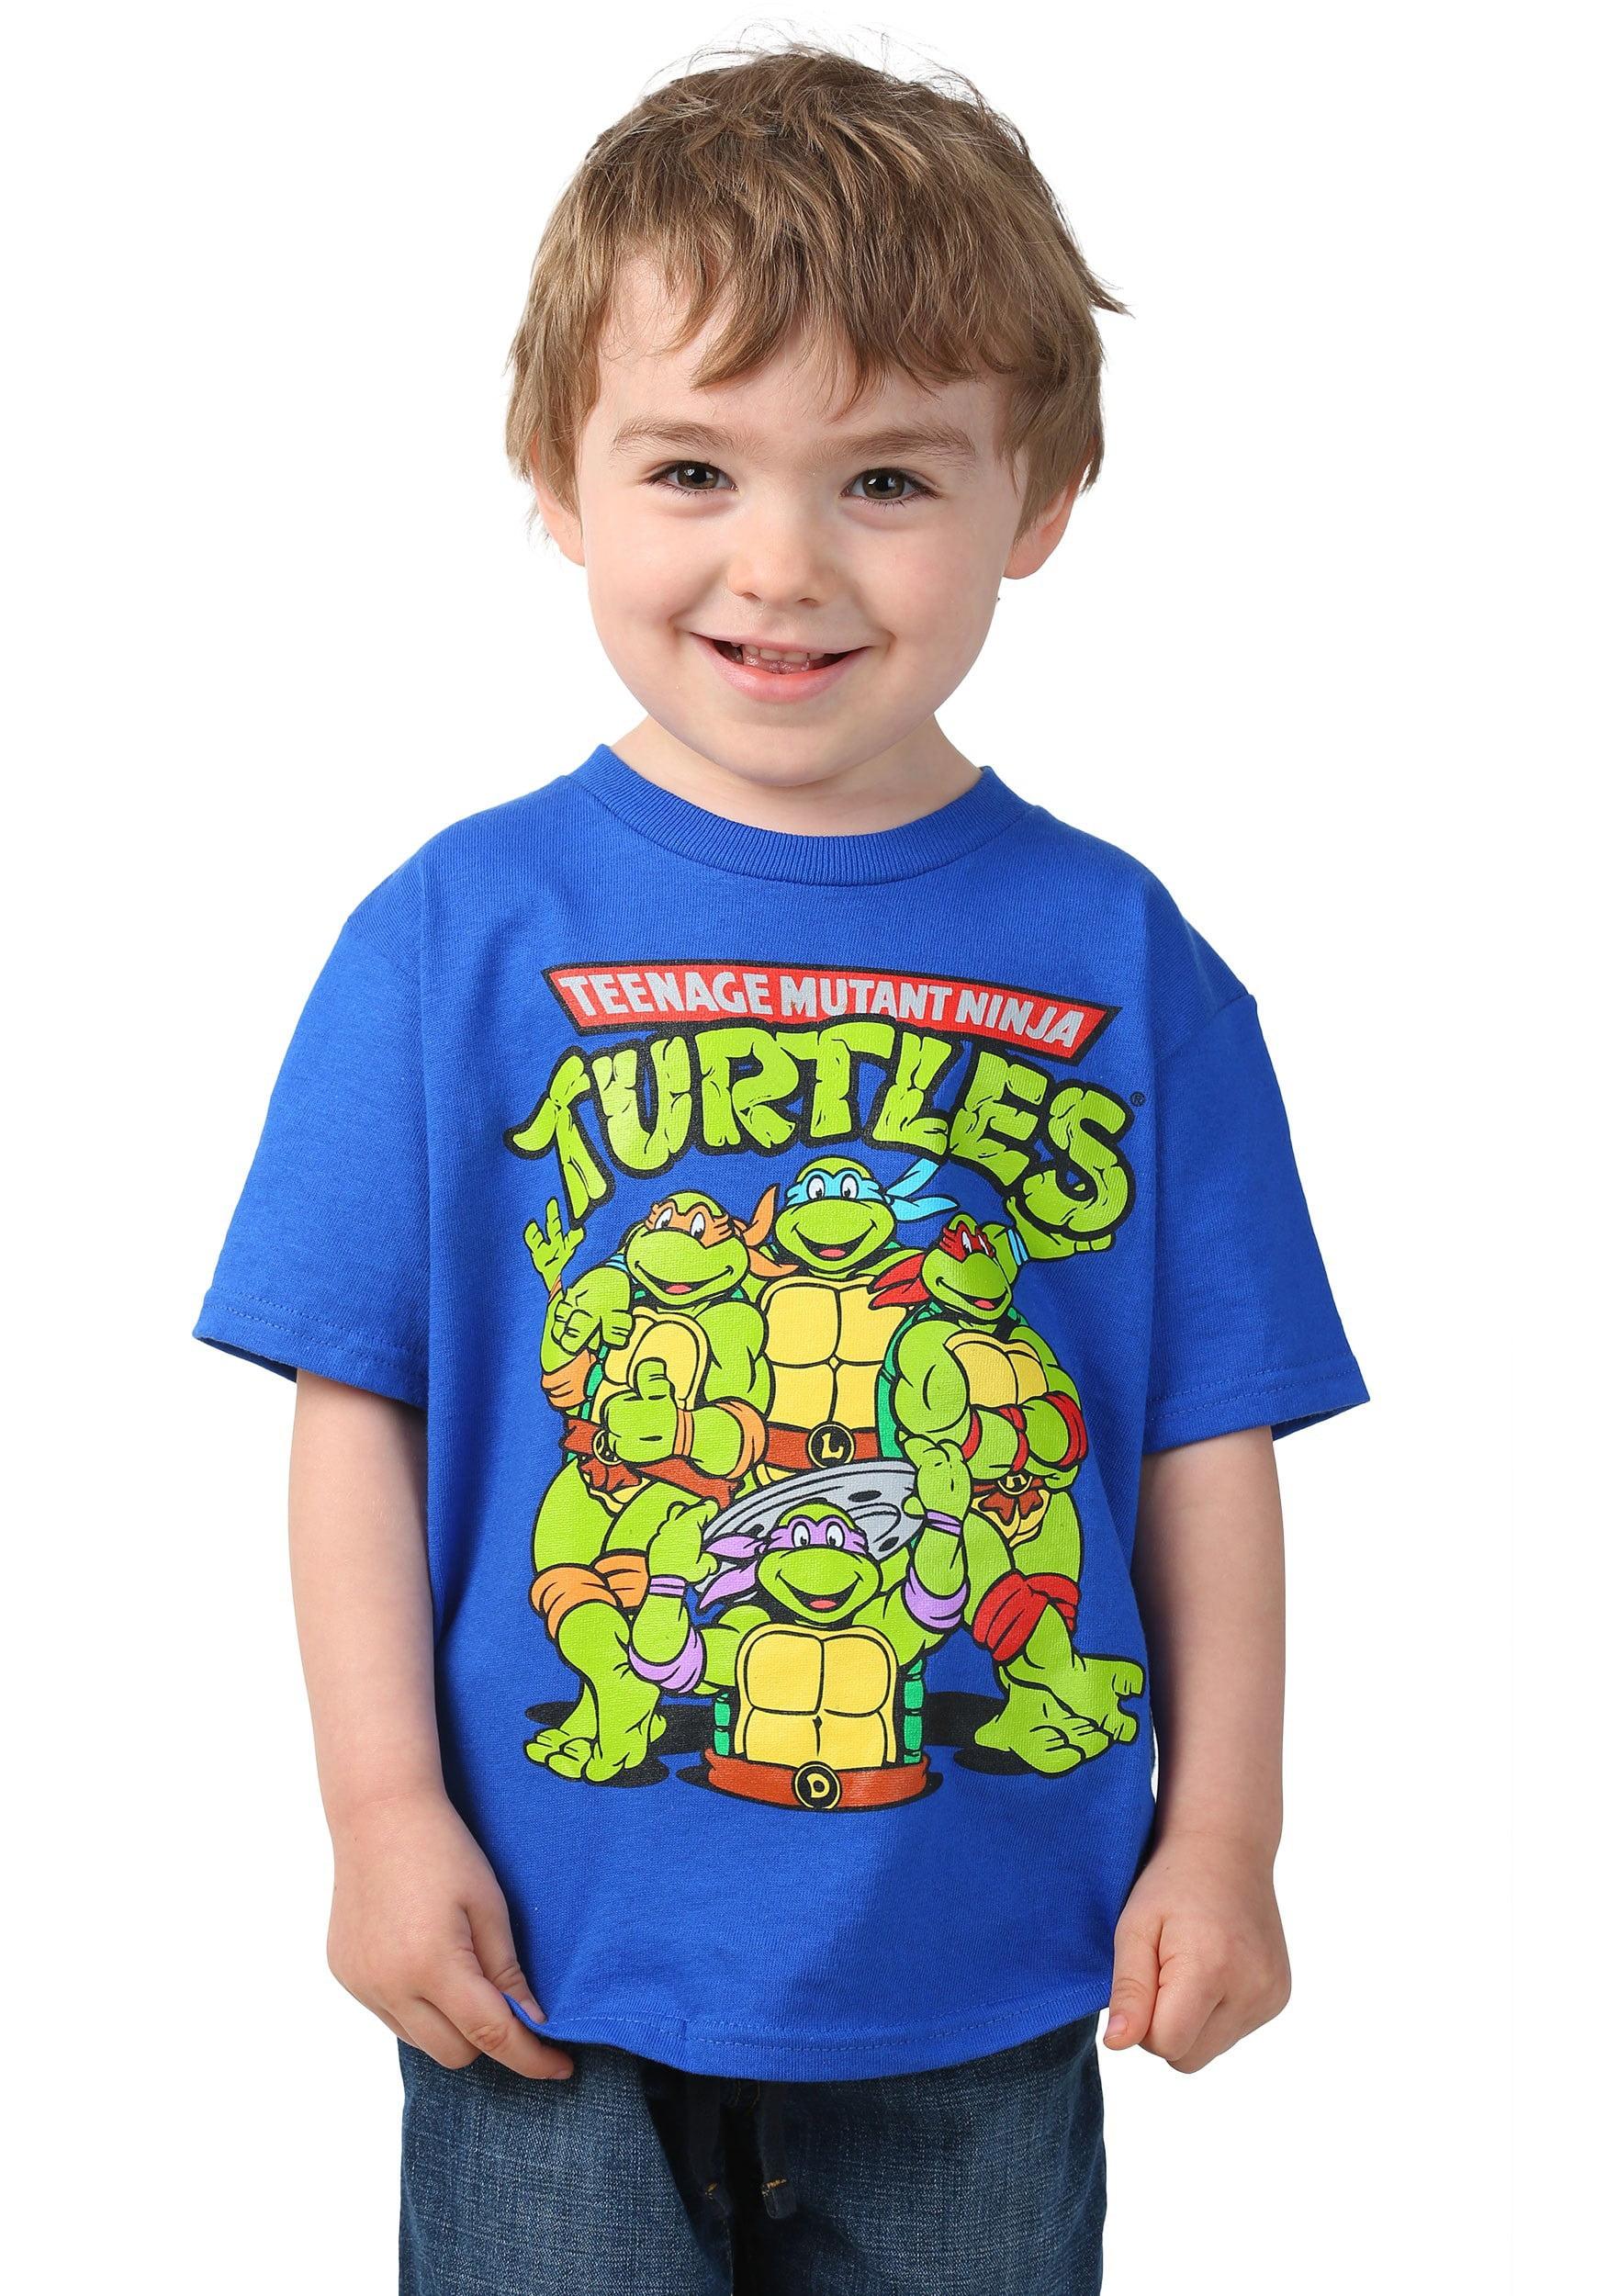 f754ea5f671 Teenage Mutant Ninja Turtles - Teenage Mutant Ninja Turtles Toddler Boys  Classic  Group Shot Logo Short Sleeve Graphic T-Shirt - Walmart.com